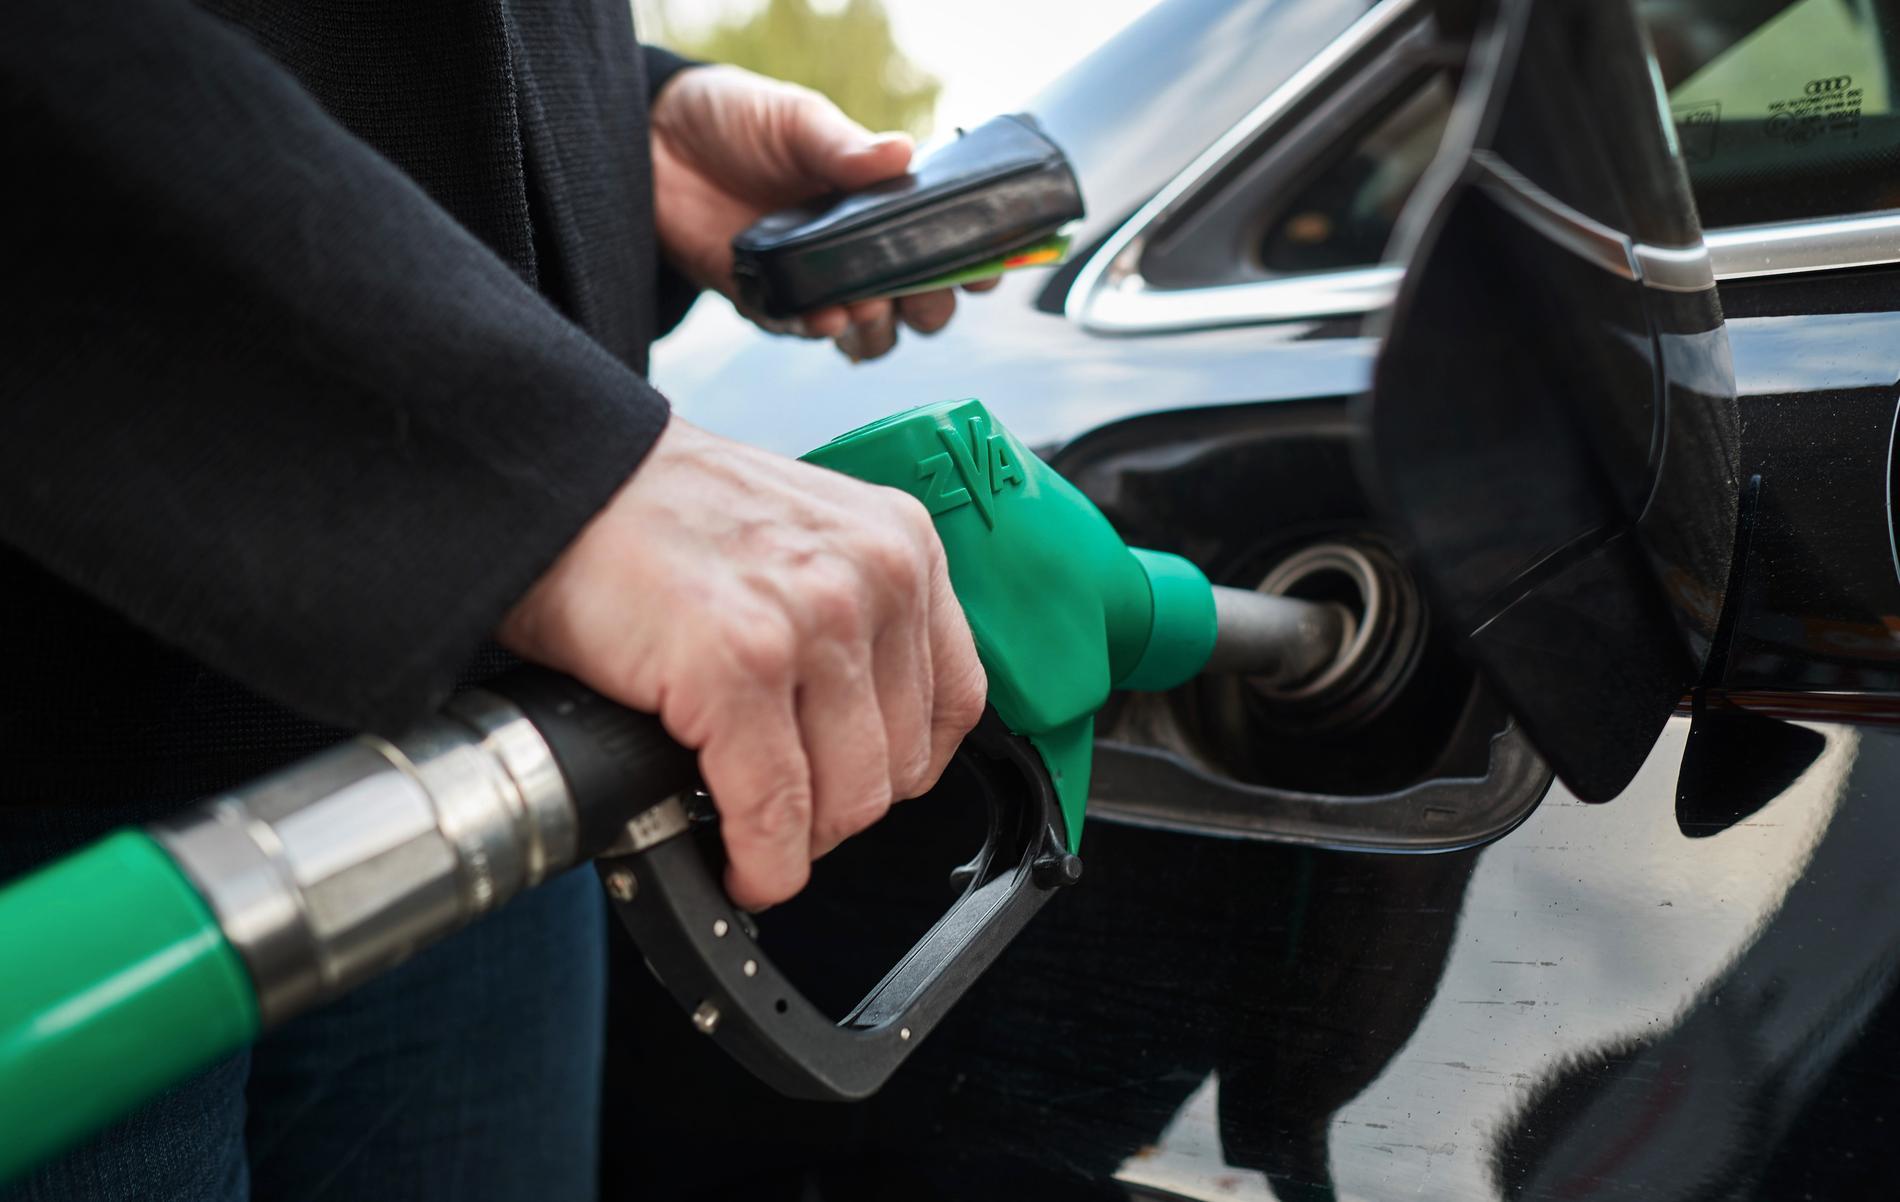 Det rekommenderade priset på 95-oktanig bensin på bemannade bensinstationer ligger i dagsläget på 13:98 kronor. Arkivbild.